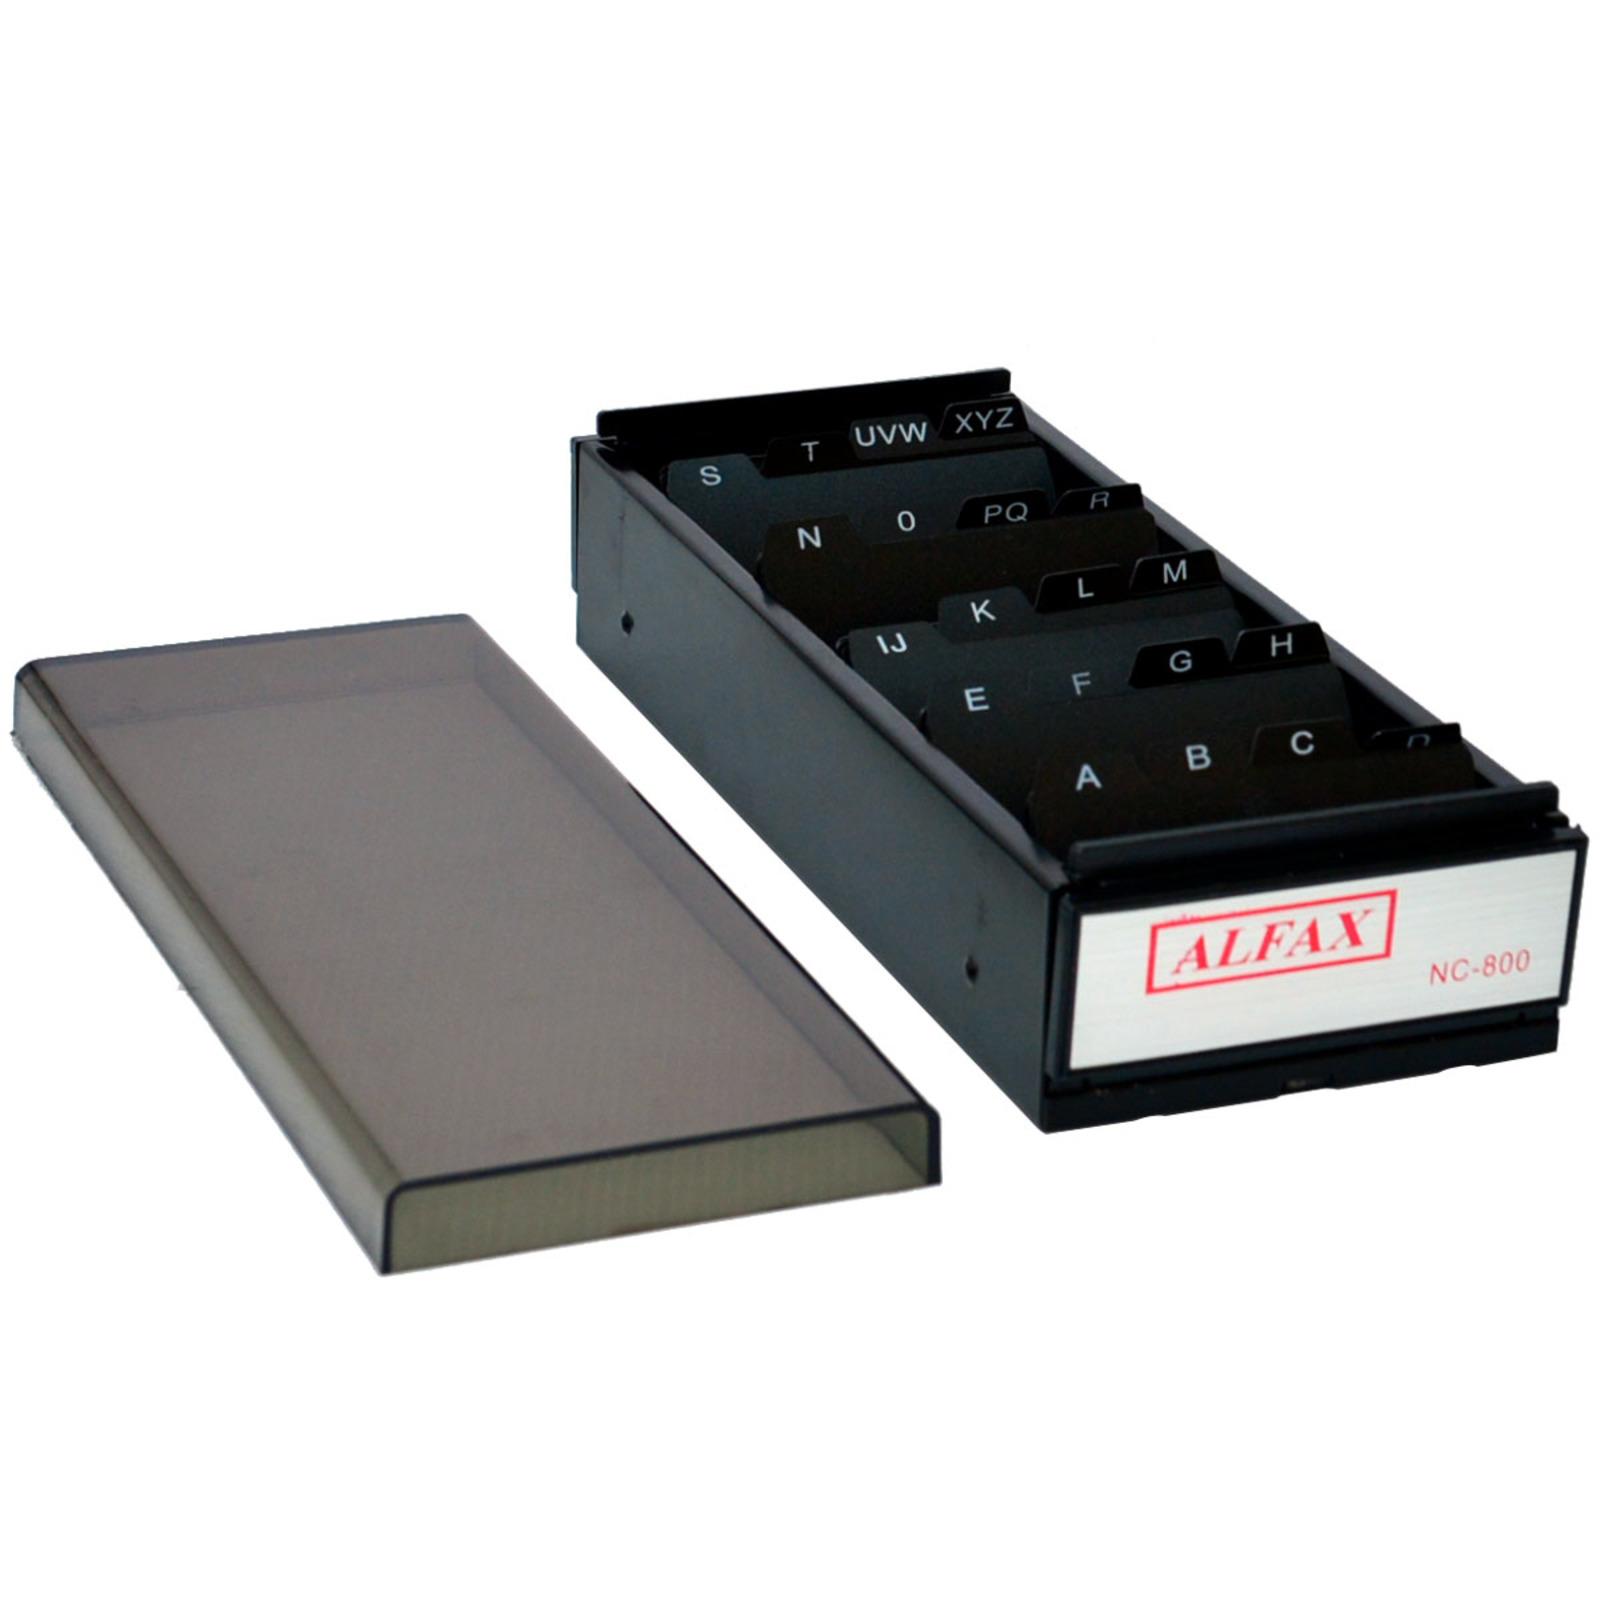 ALFAX NC800 Name Card Case